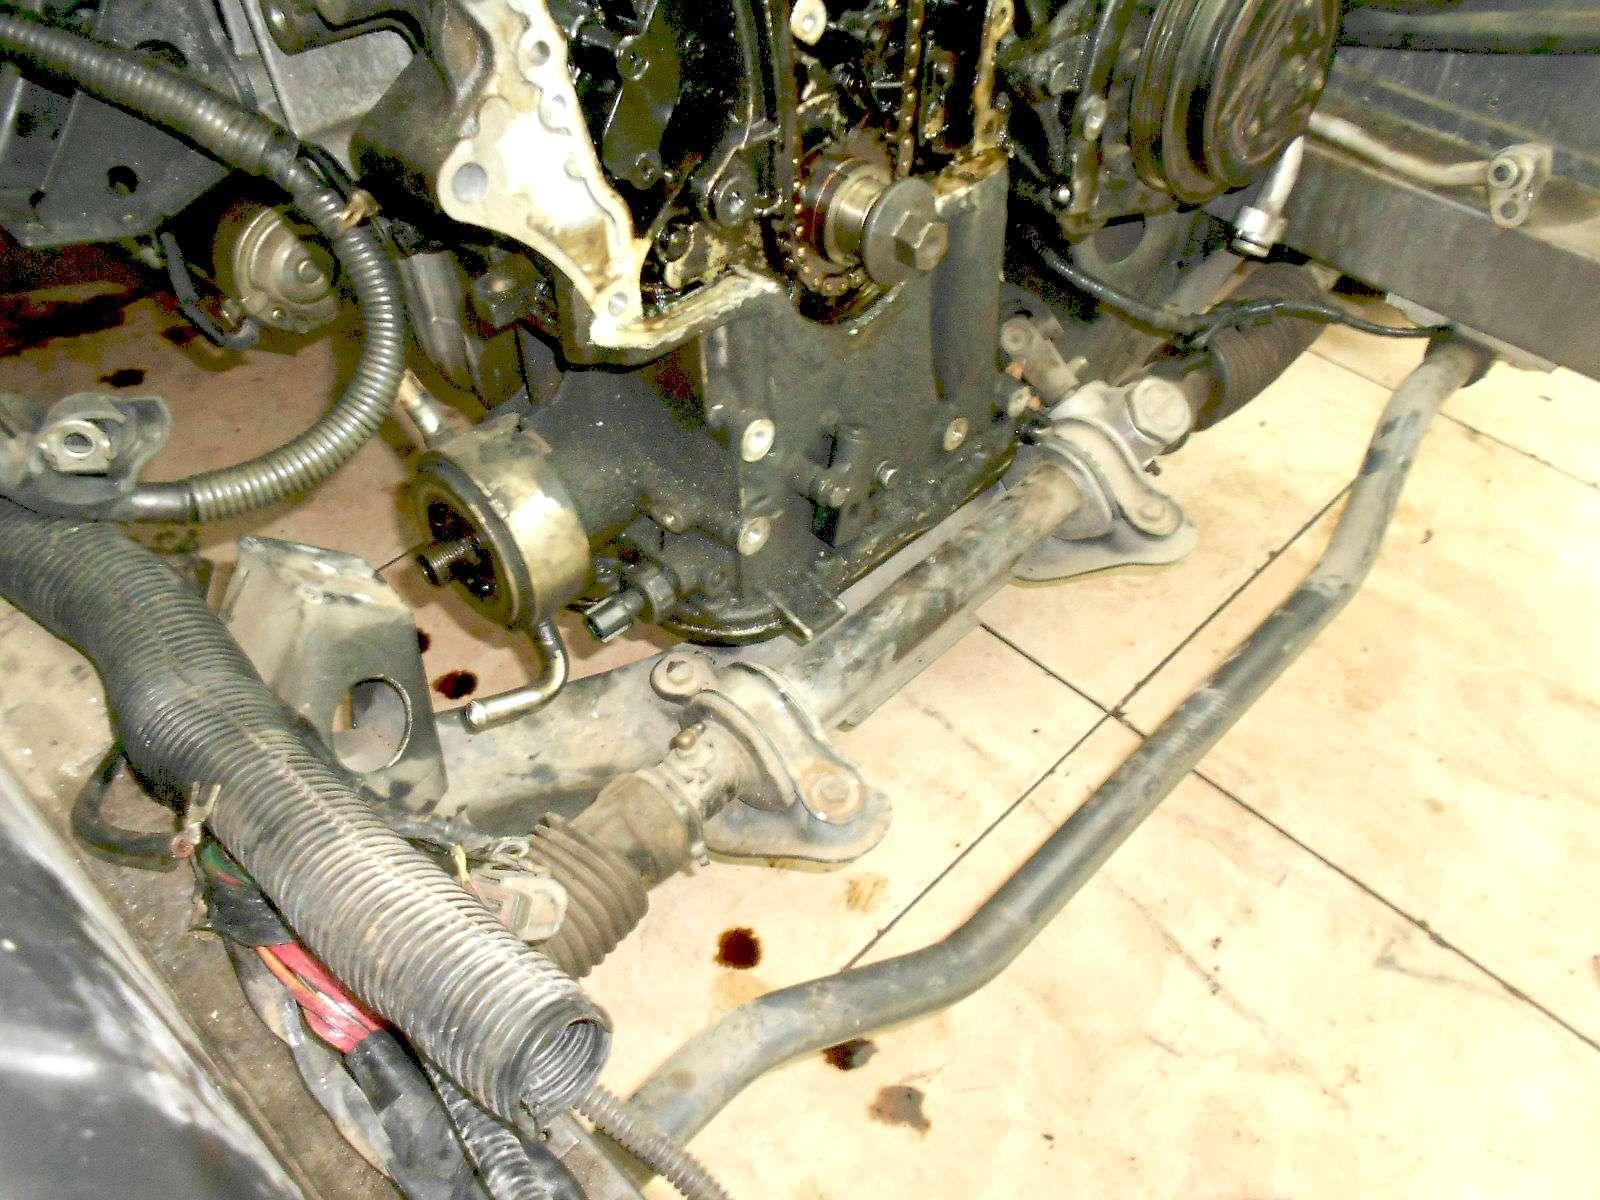 Project RB-Z - Page 19 - Nissan 370Z Forum